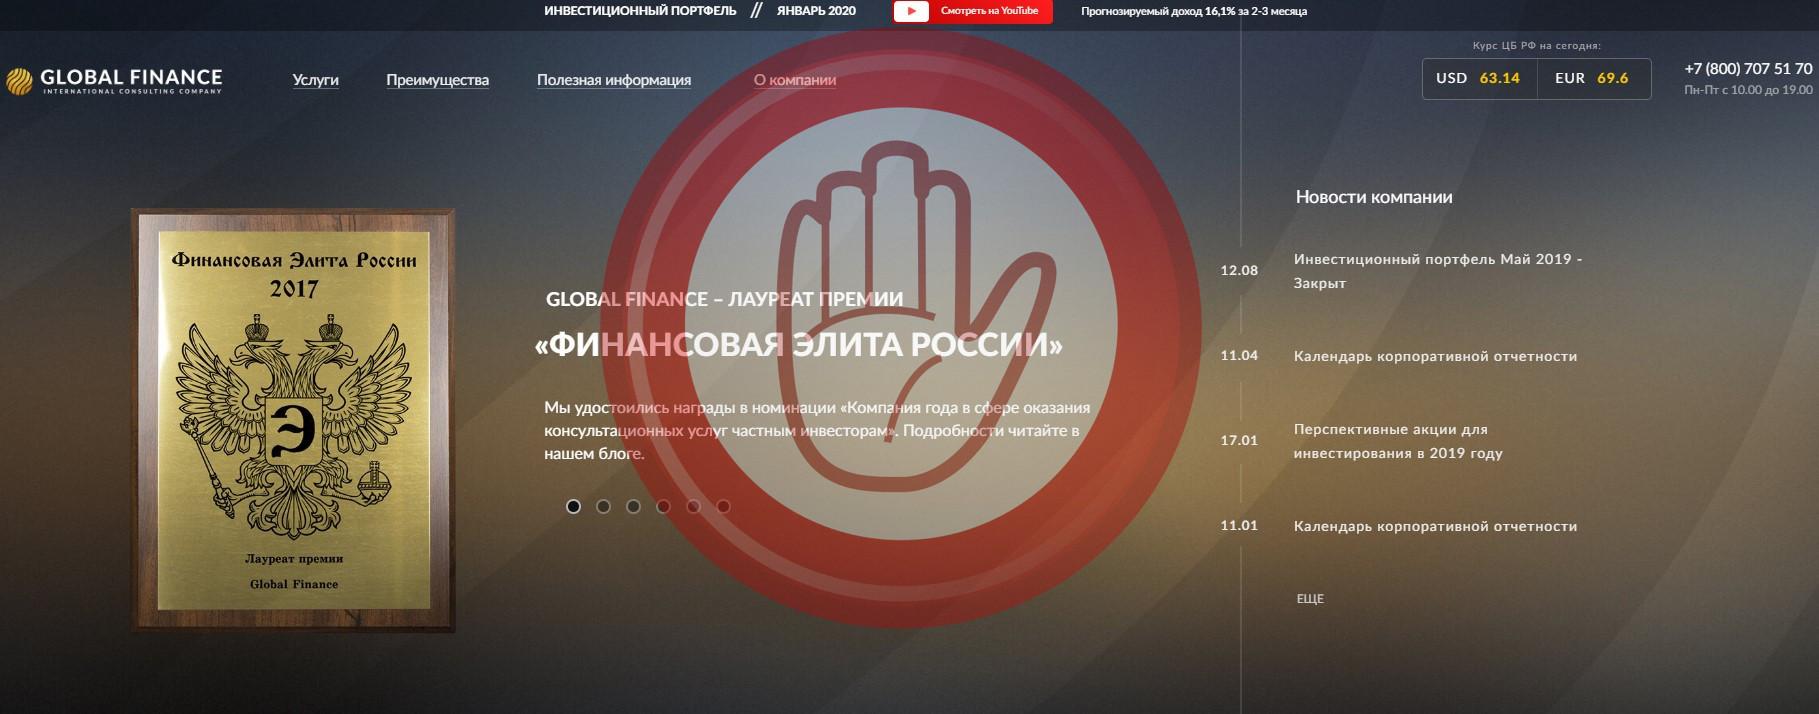 Global Finance — псевдо-консалтинговая компания, glob-finance.ru